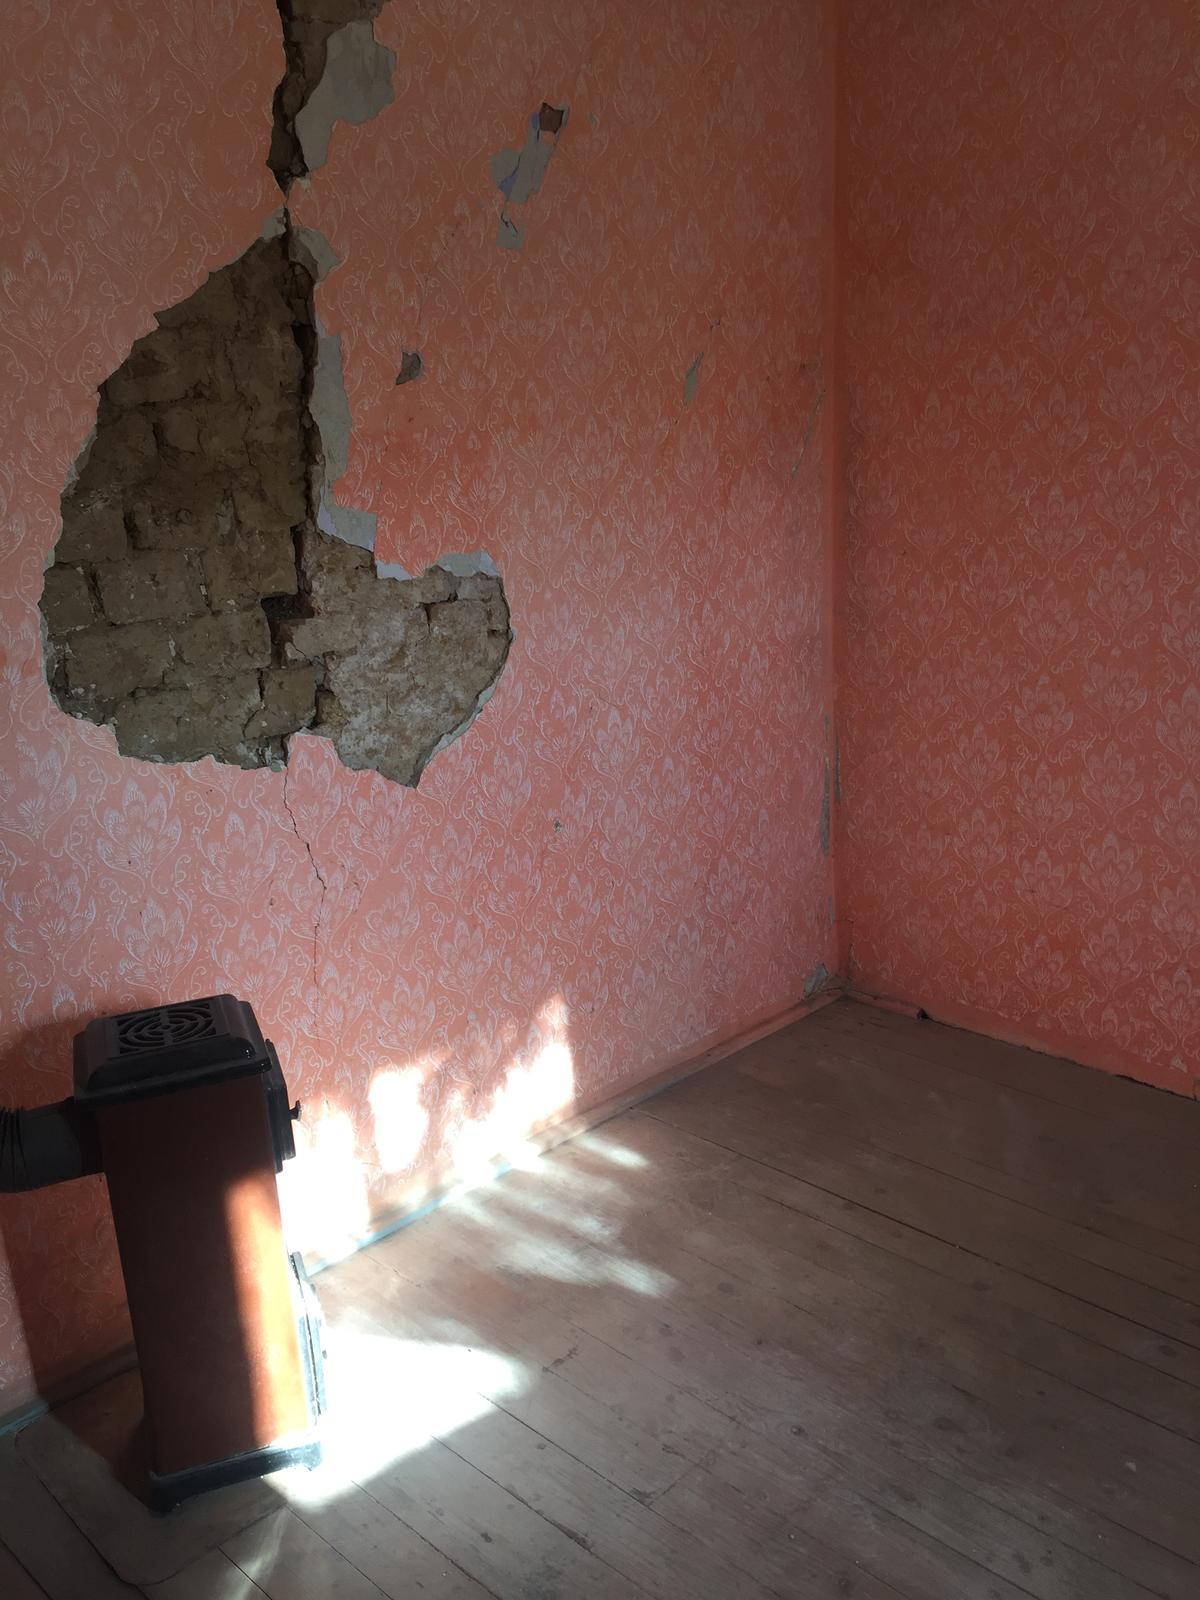 Perníková chalúpka - Jedna izba vyprataná...   Budúca jedáleň.